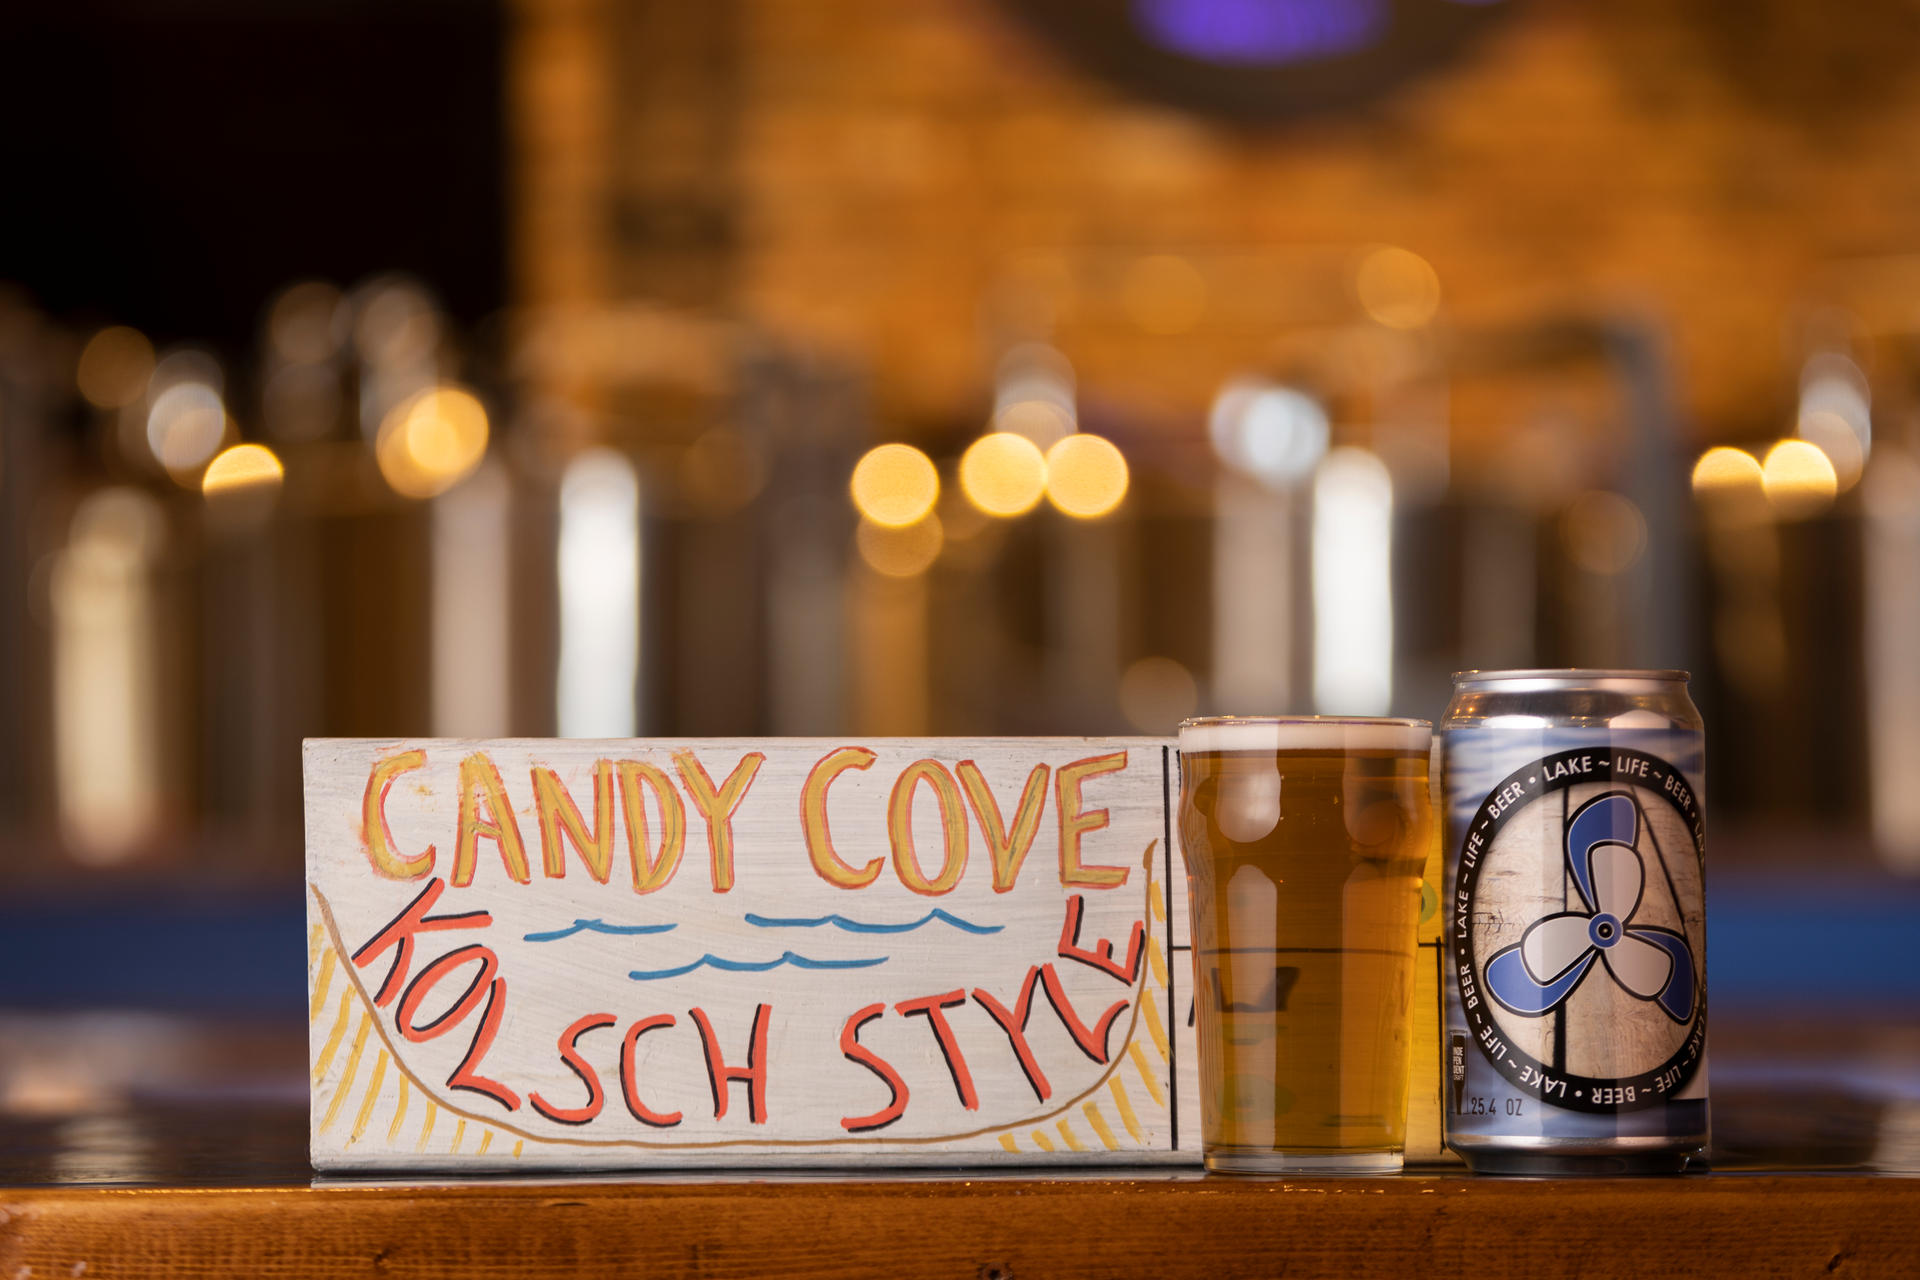 Candy Cove Kolsch